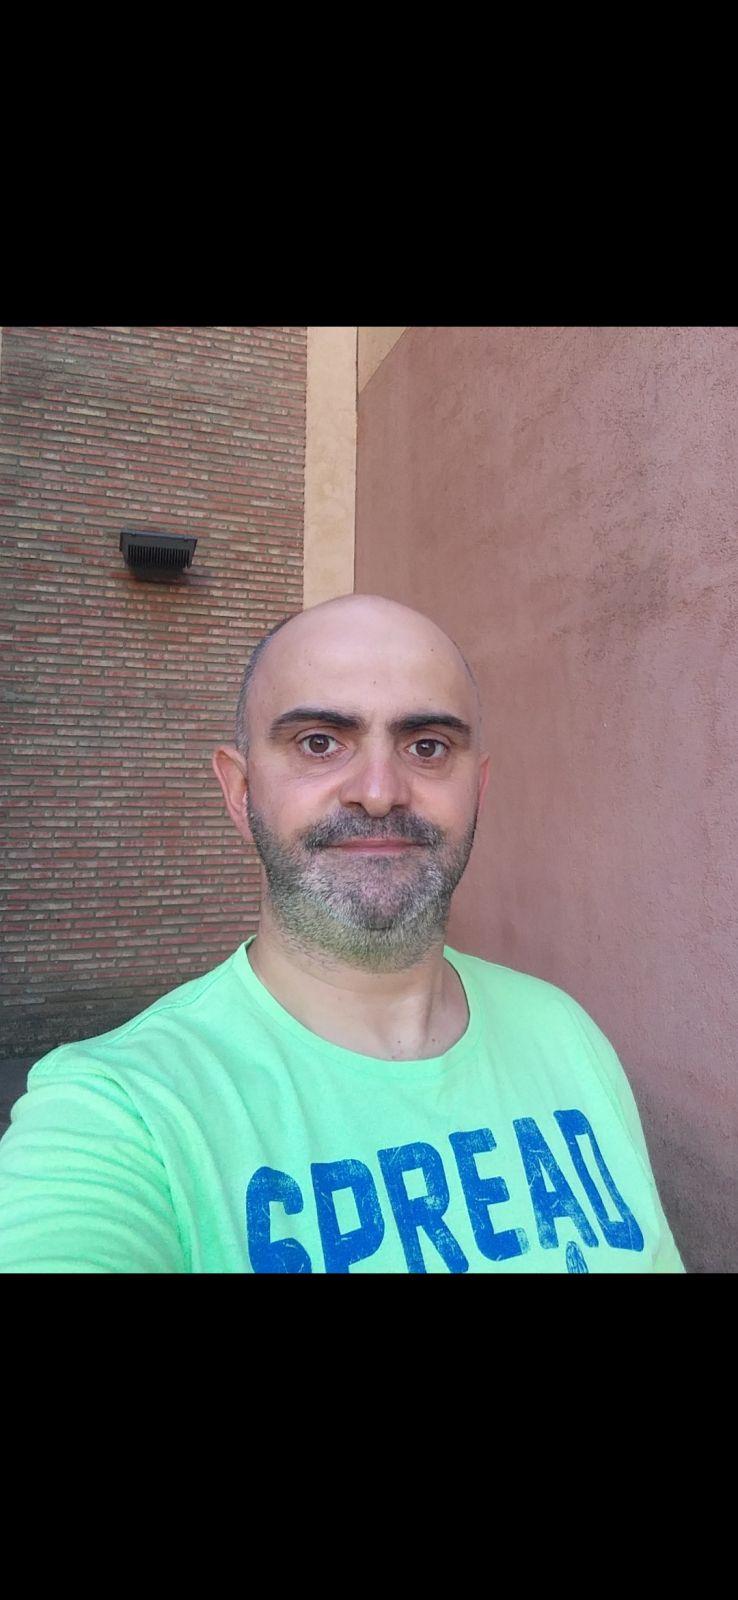 Antonio1975